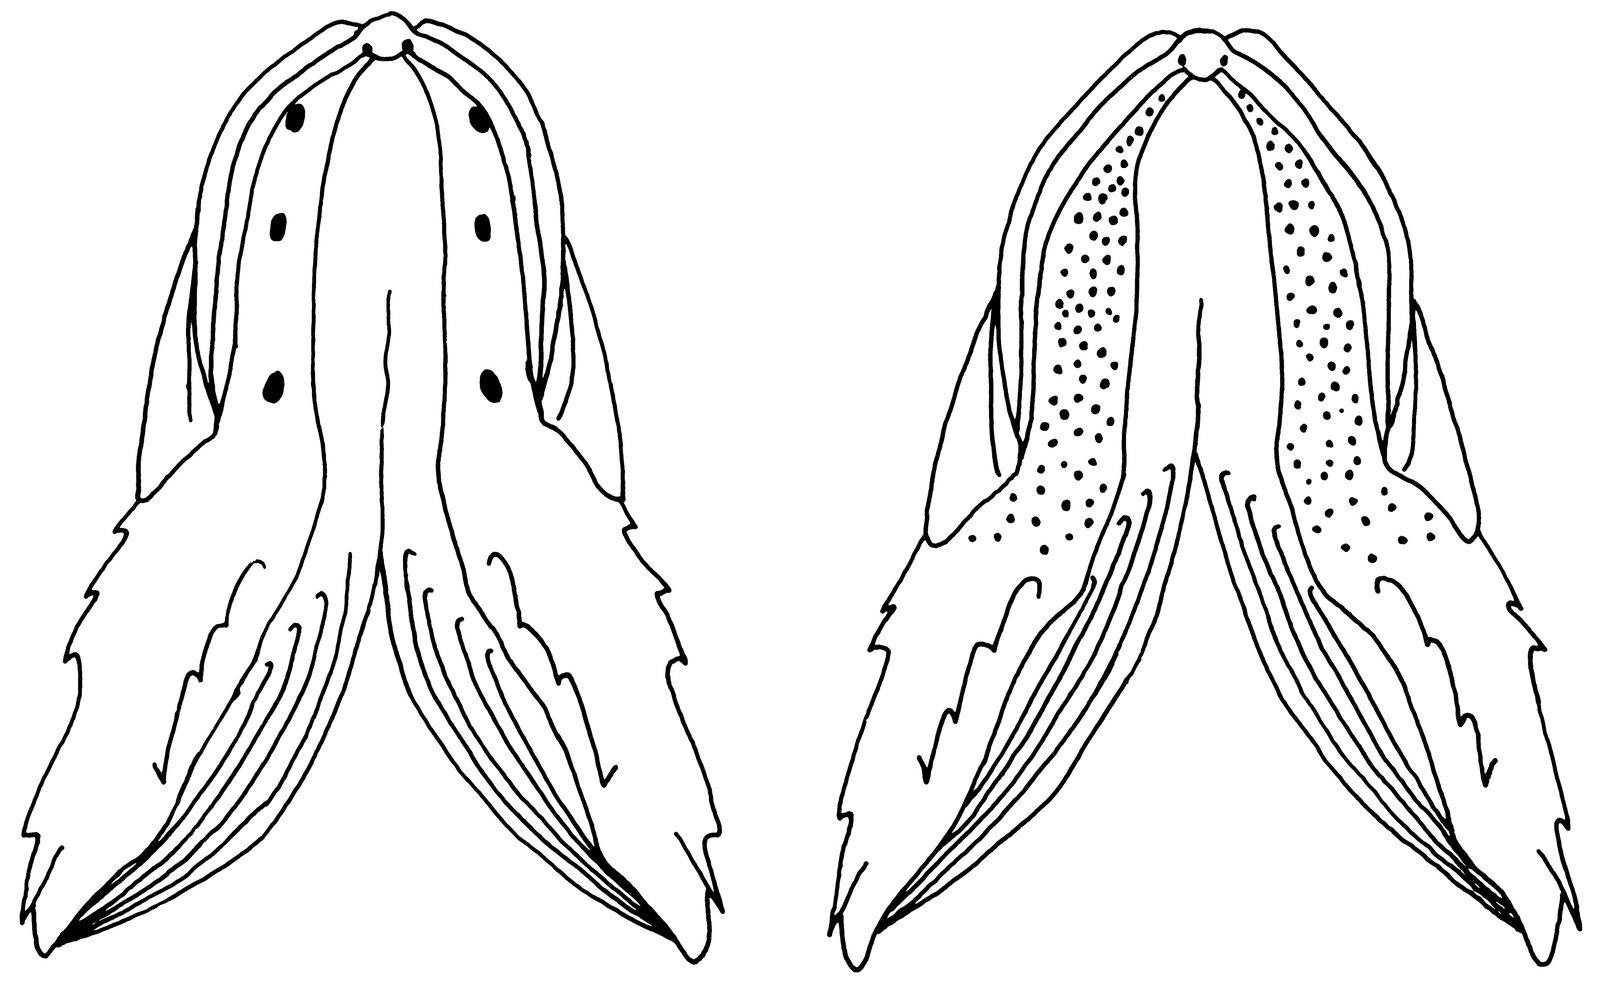 Common Gurnard Perch, Neosebastes scorpaenoides